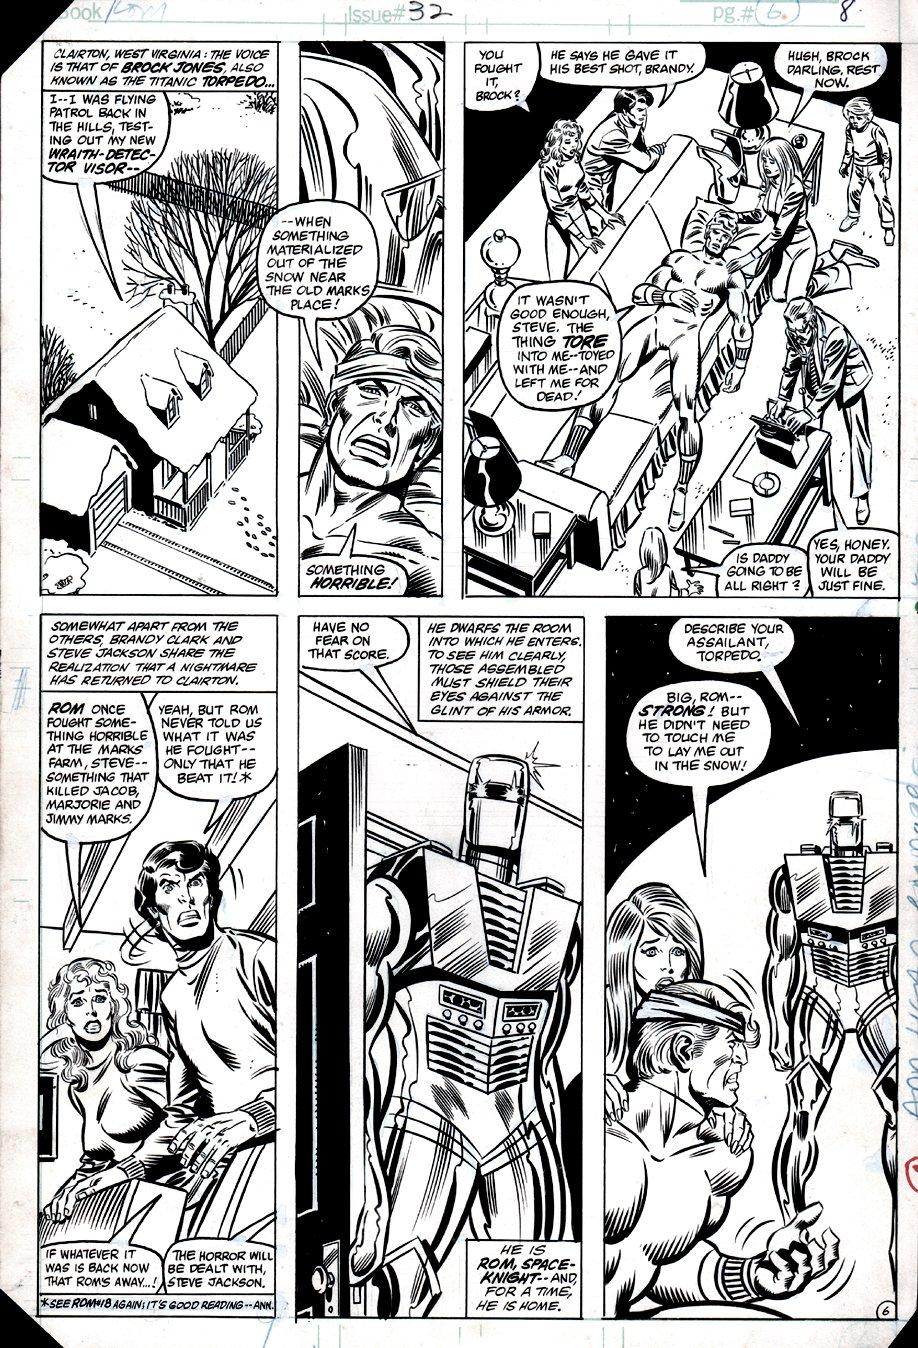 ROM #32 p 6 (ROM, Torpedo, Brandy Clark, Steve Jackson!) 1982